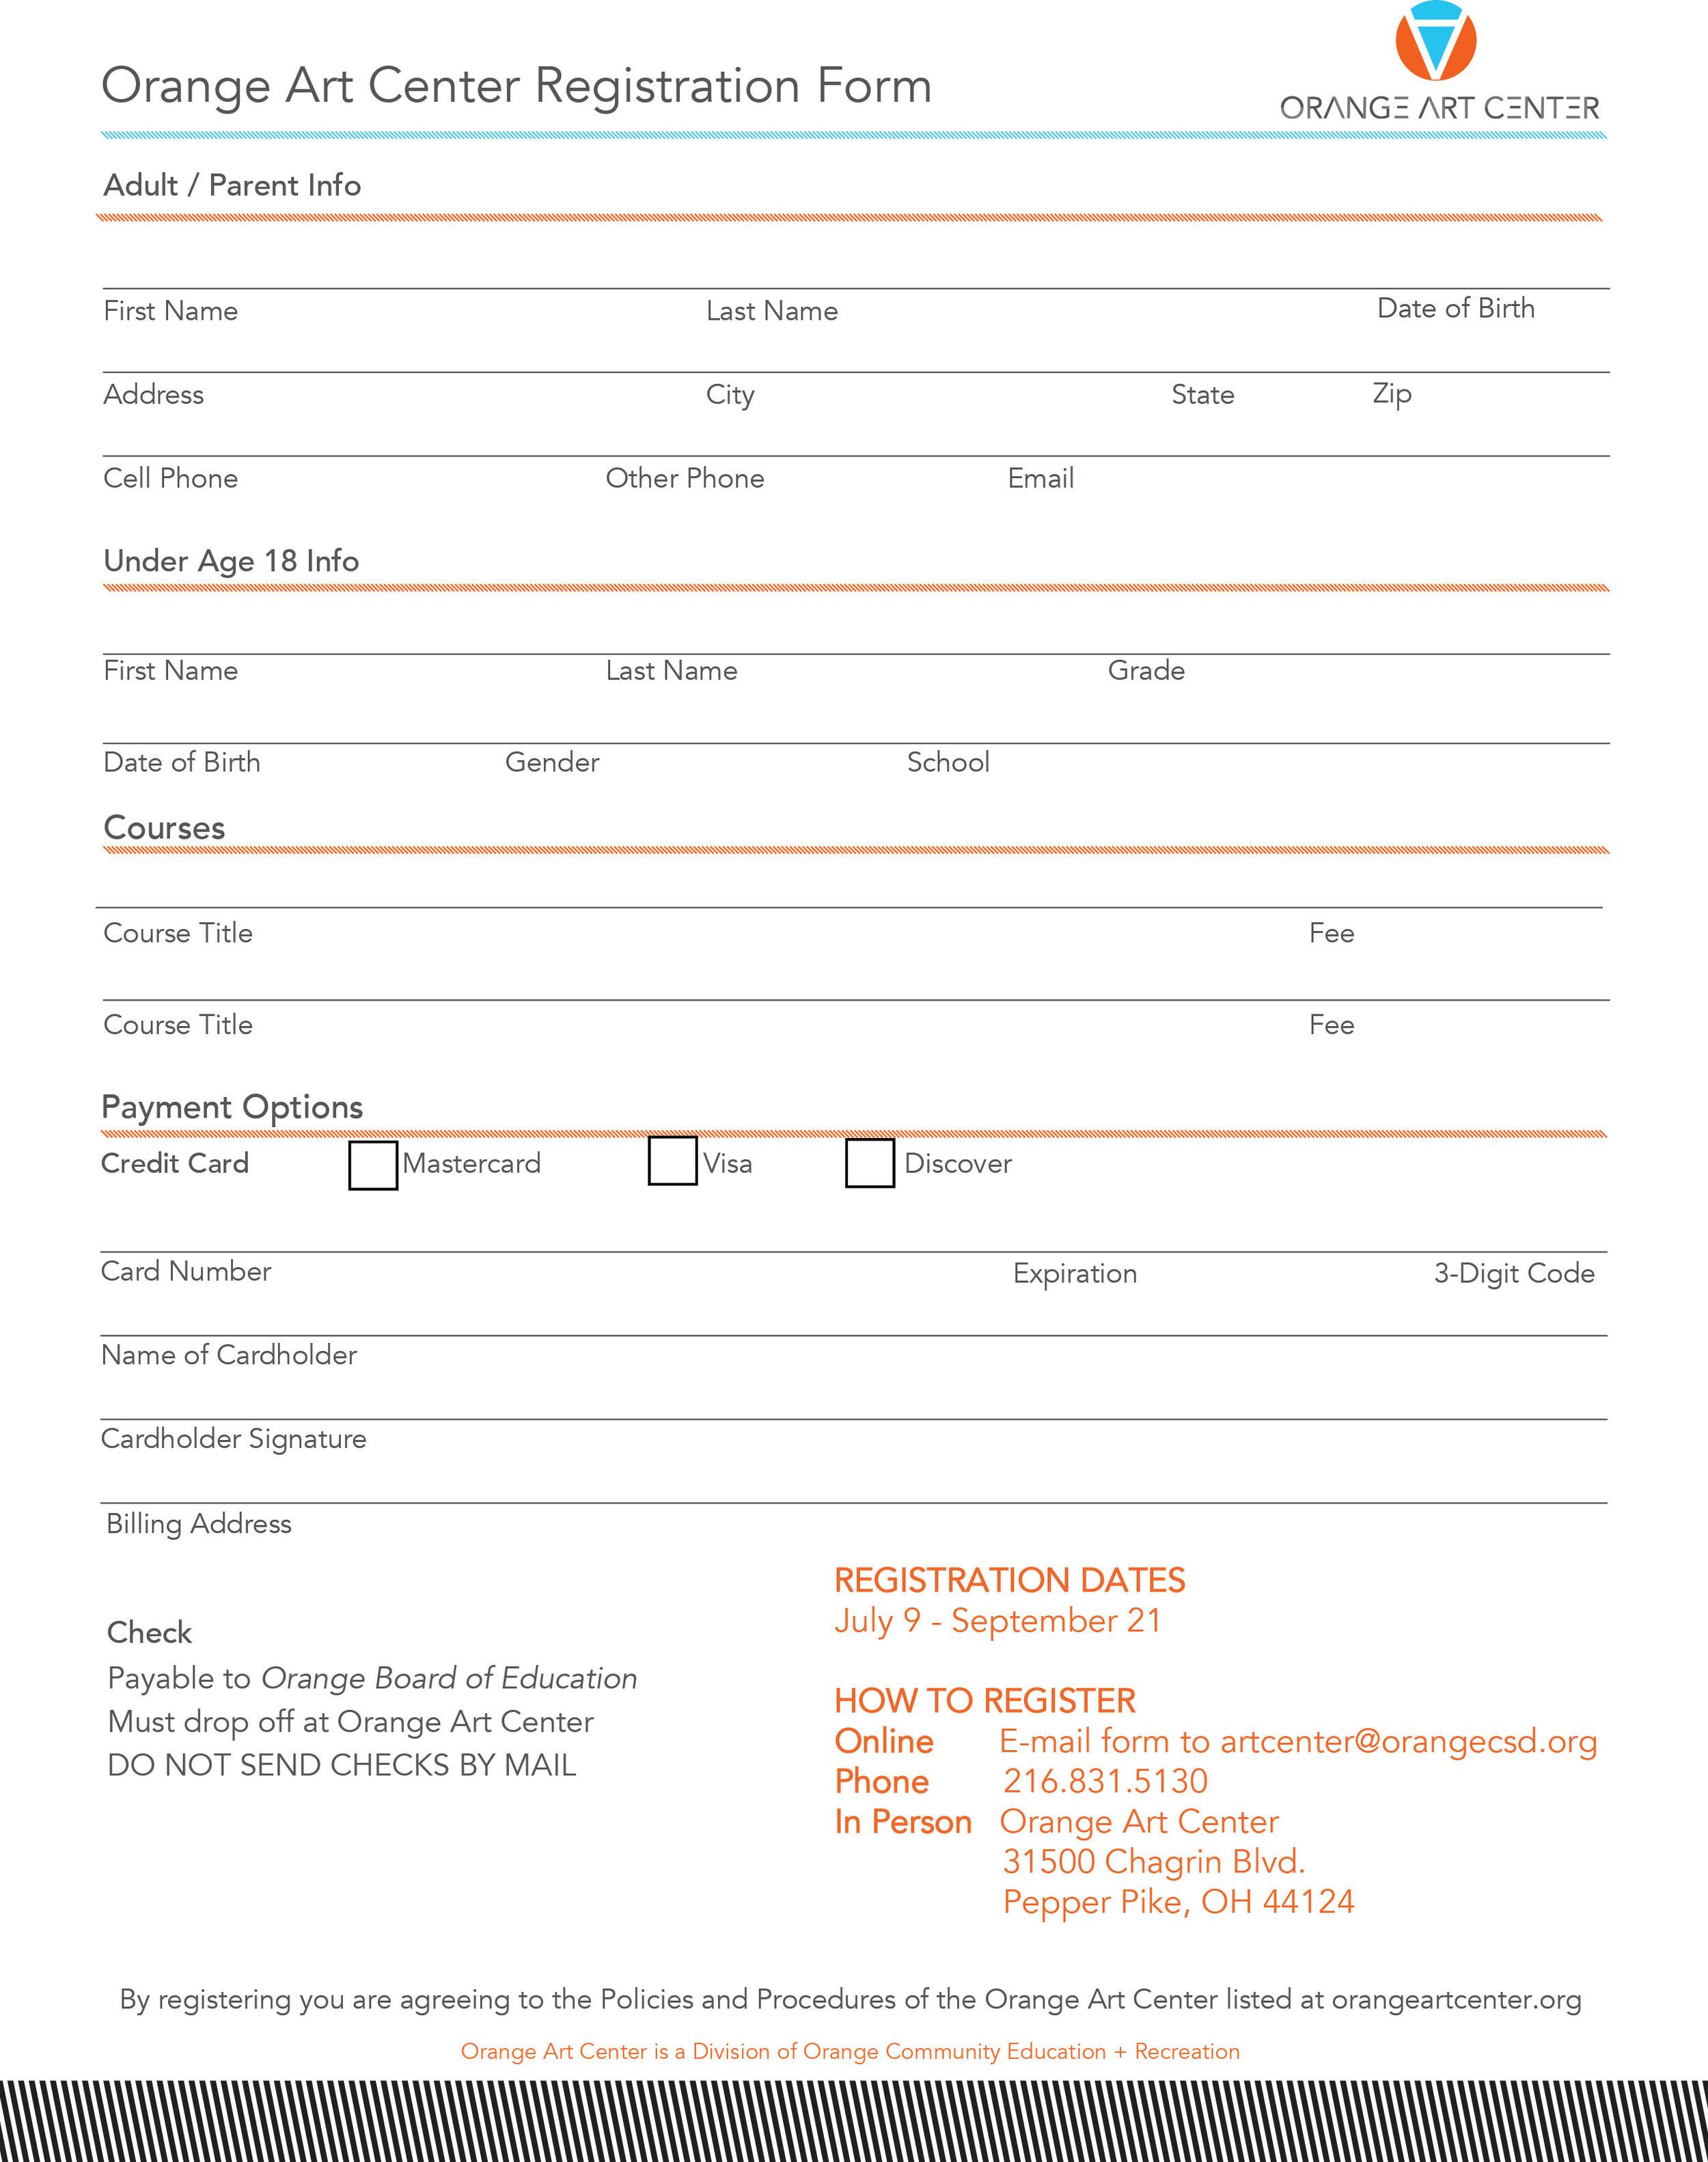 OAC-Registration-Form-2018.jpg